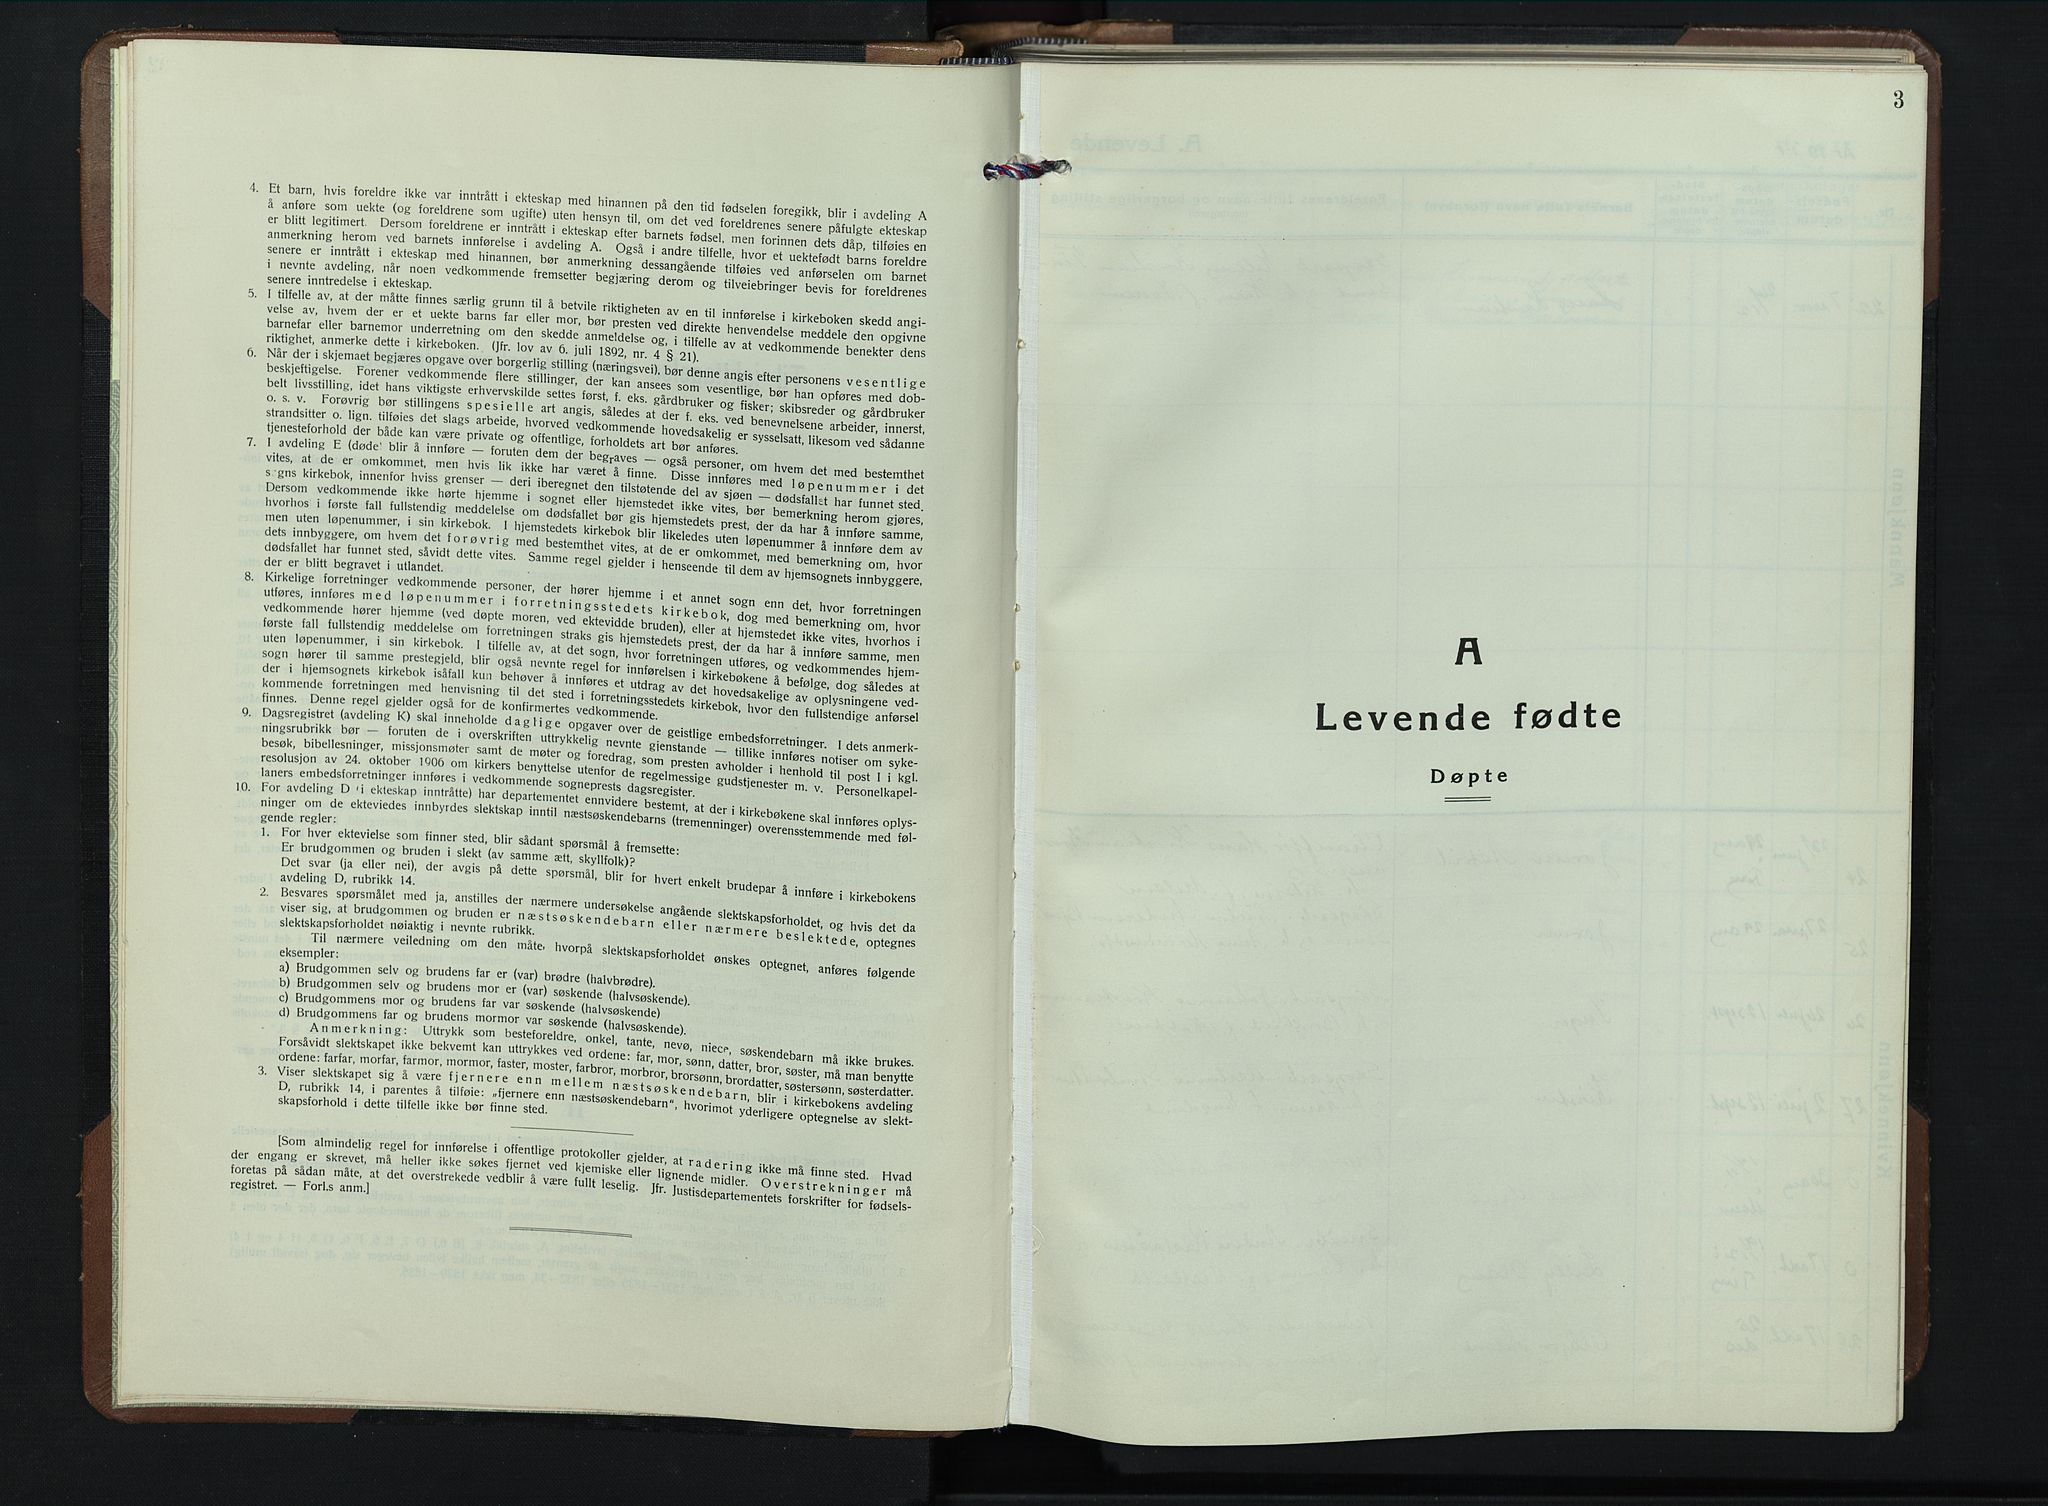 SAH, Brandbu prestekontor, Klokkerbok nr. 2, 1937-1953, s. 3